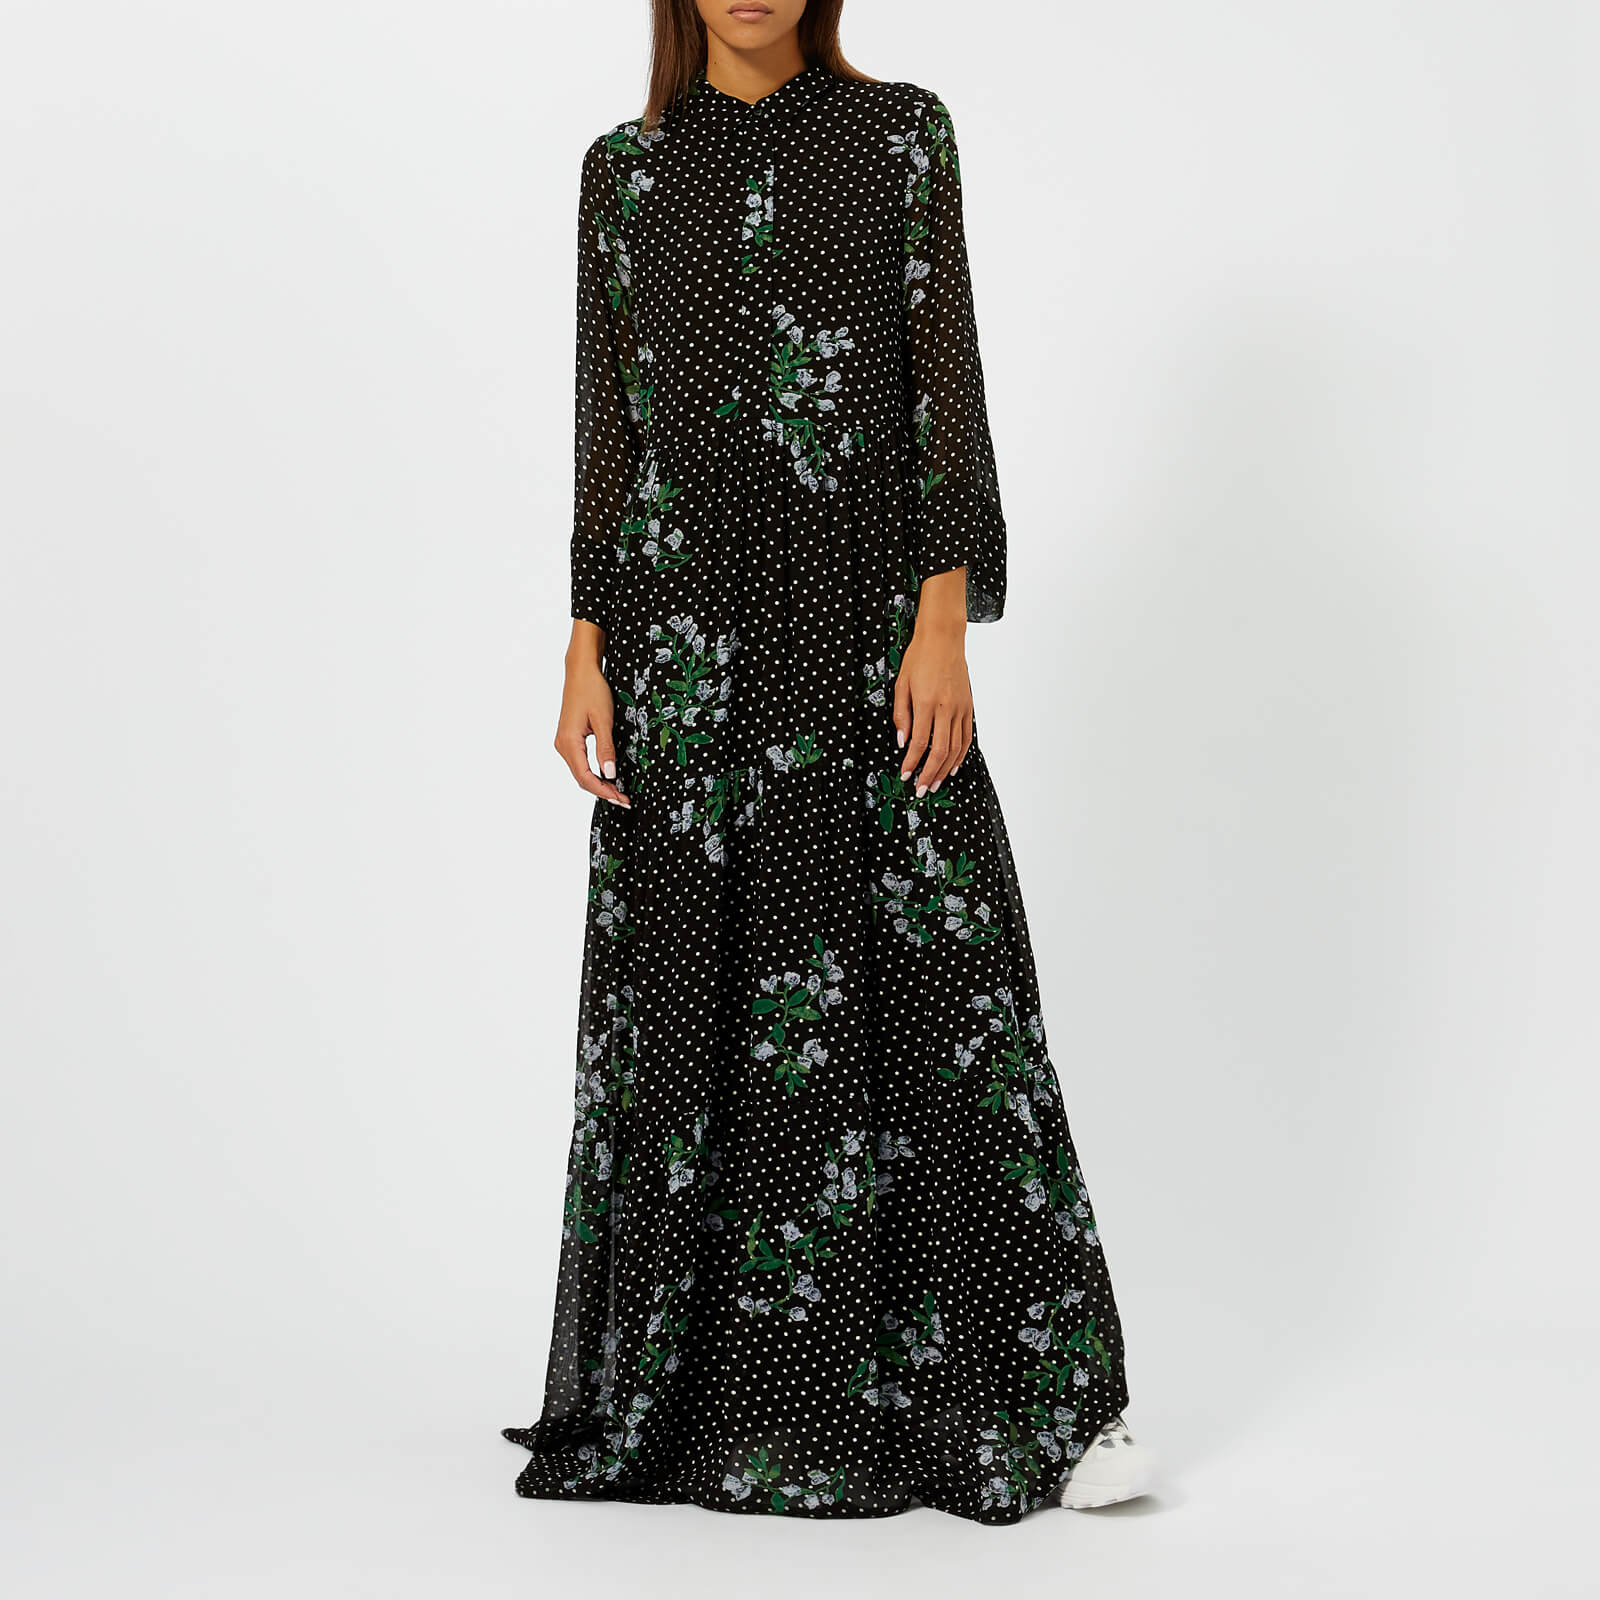 41ff706f Ganni Women's Rometty Georgette Dress - Black - Free UK Delivery over £50